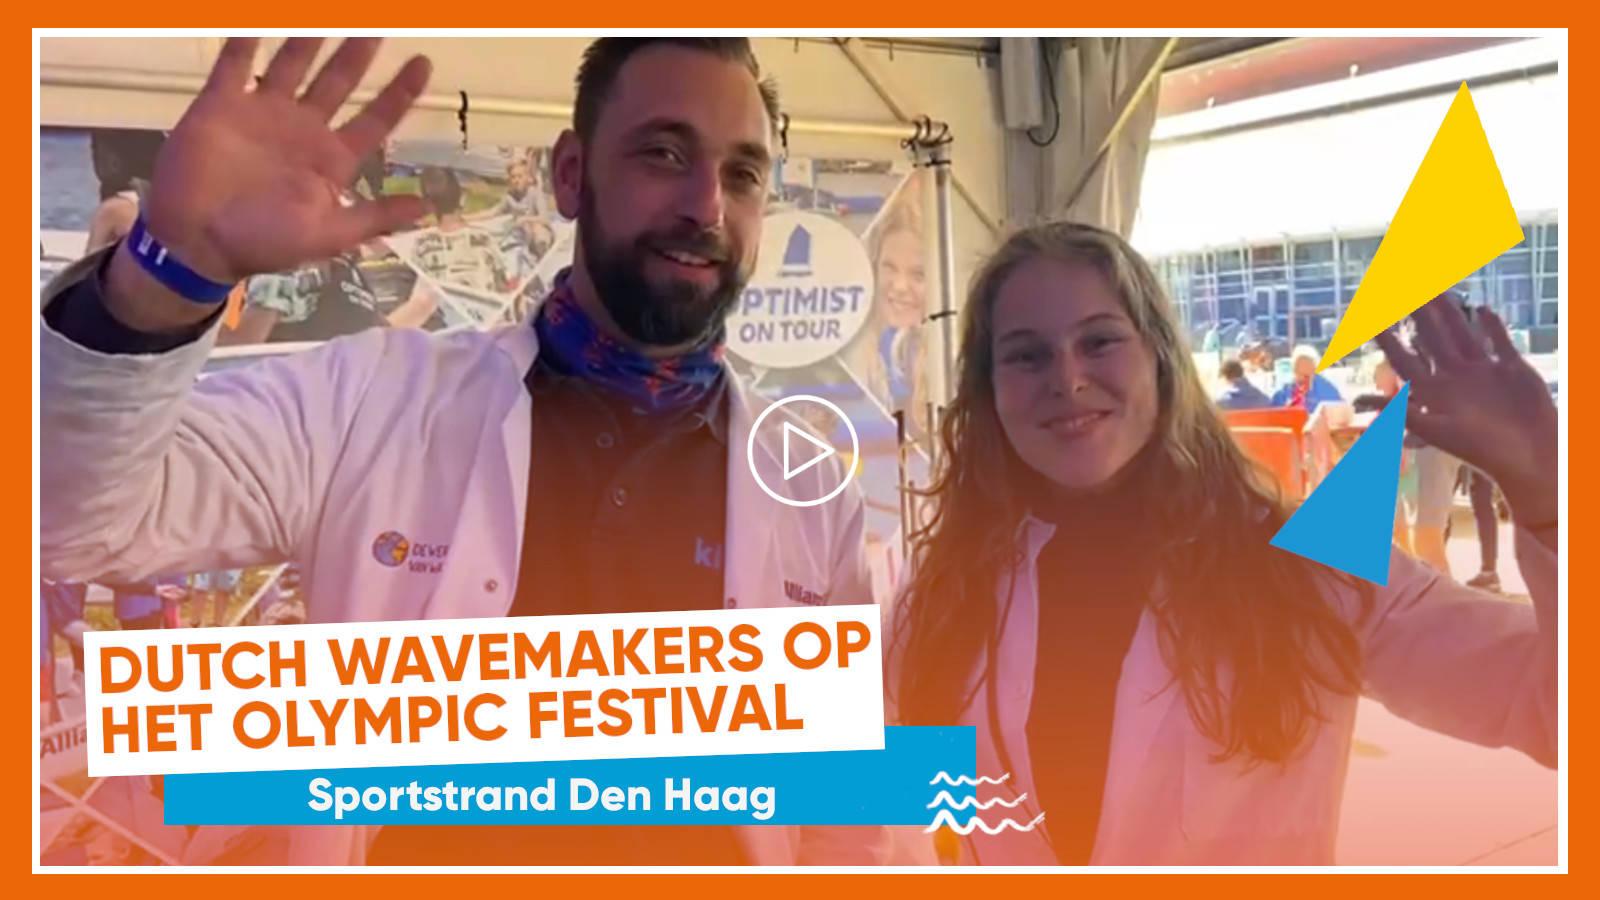 olympicfestival_thumbnail100